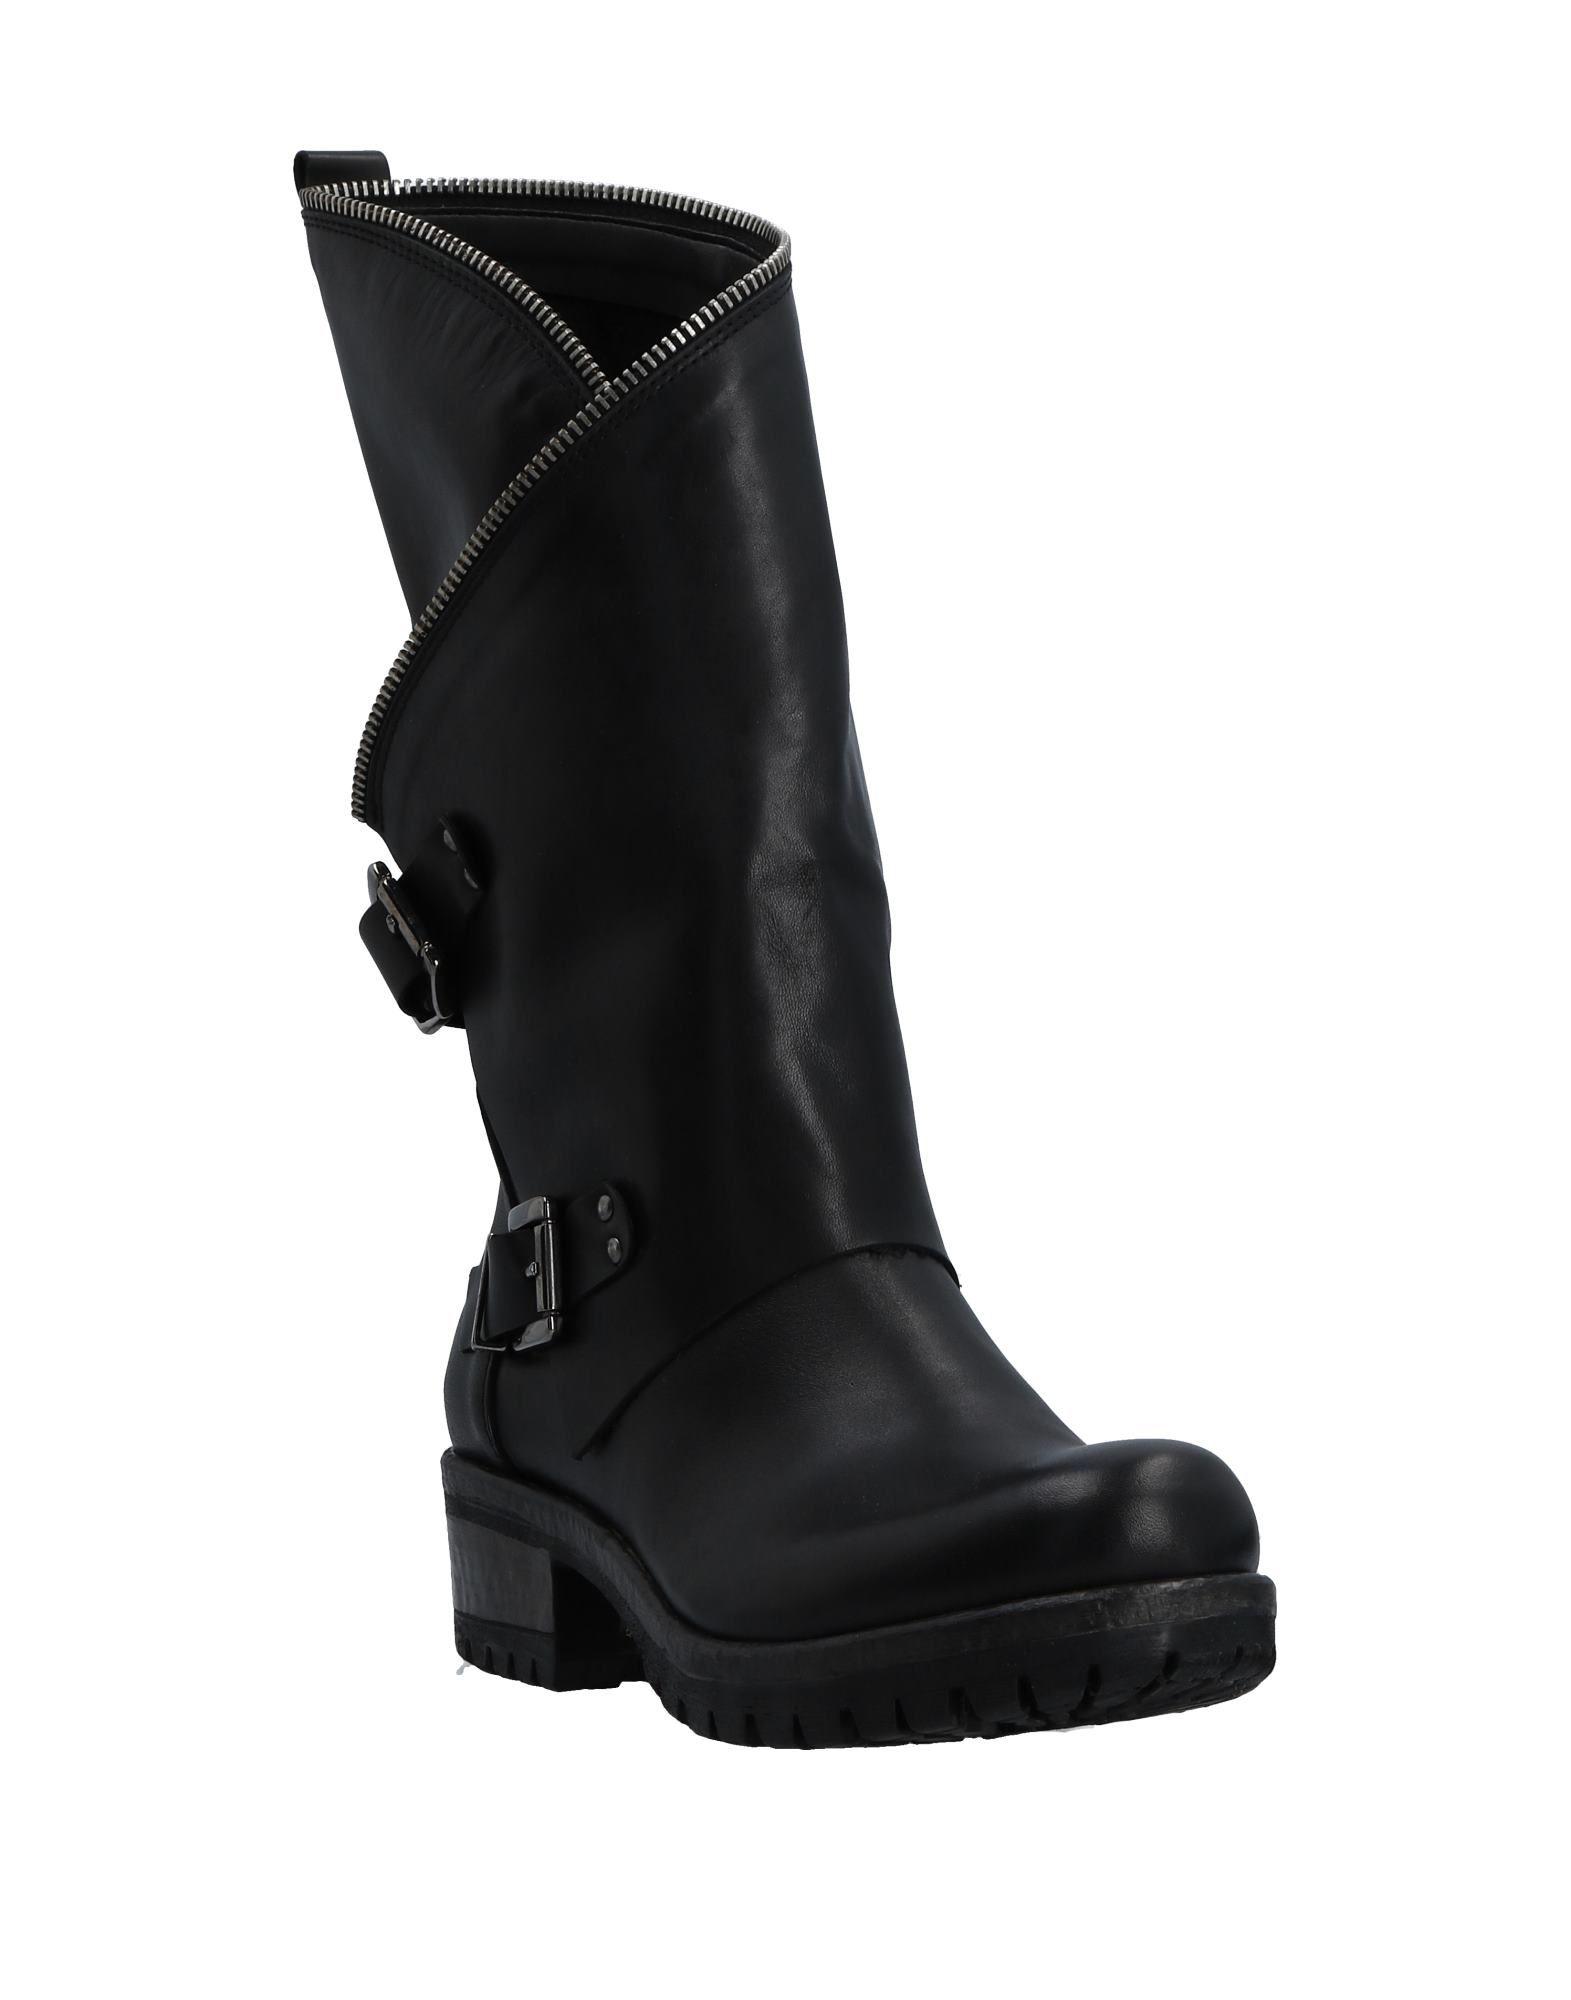 Stilvolle billige Schuhe Schuhe billige Chocolà Stiefel Damen  11529377PR 56b70f